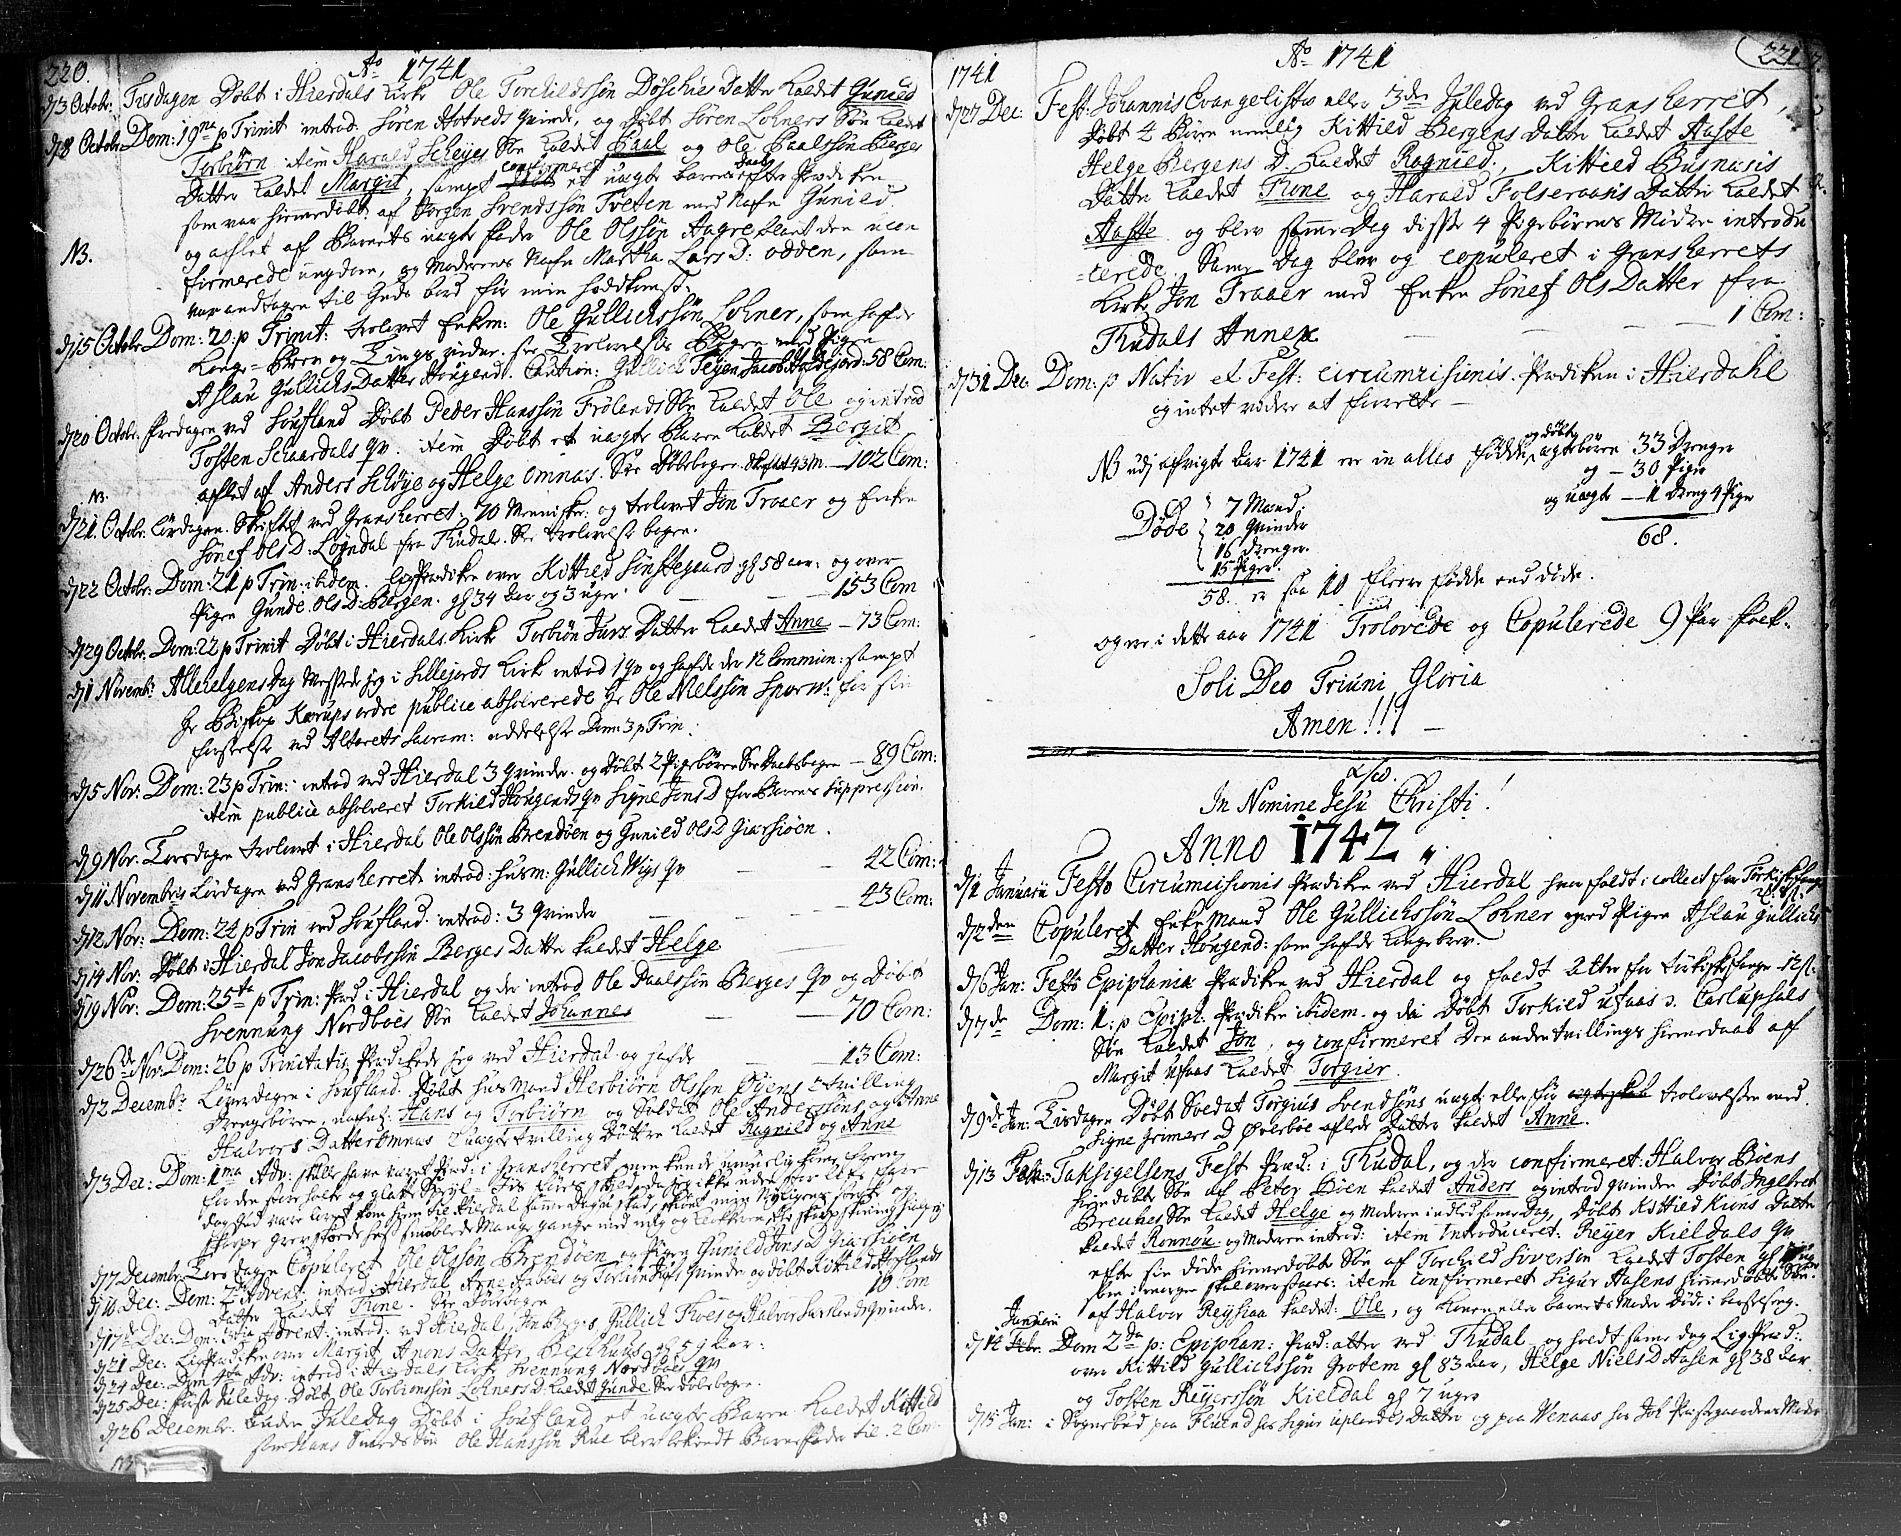 SAKO, Hjartdal kirkebøker, F/Fa/L0002: Ministerialbok nr. I 2, 1716-1754, s. 220-221